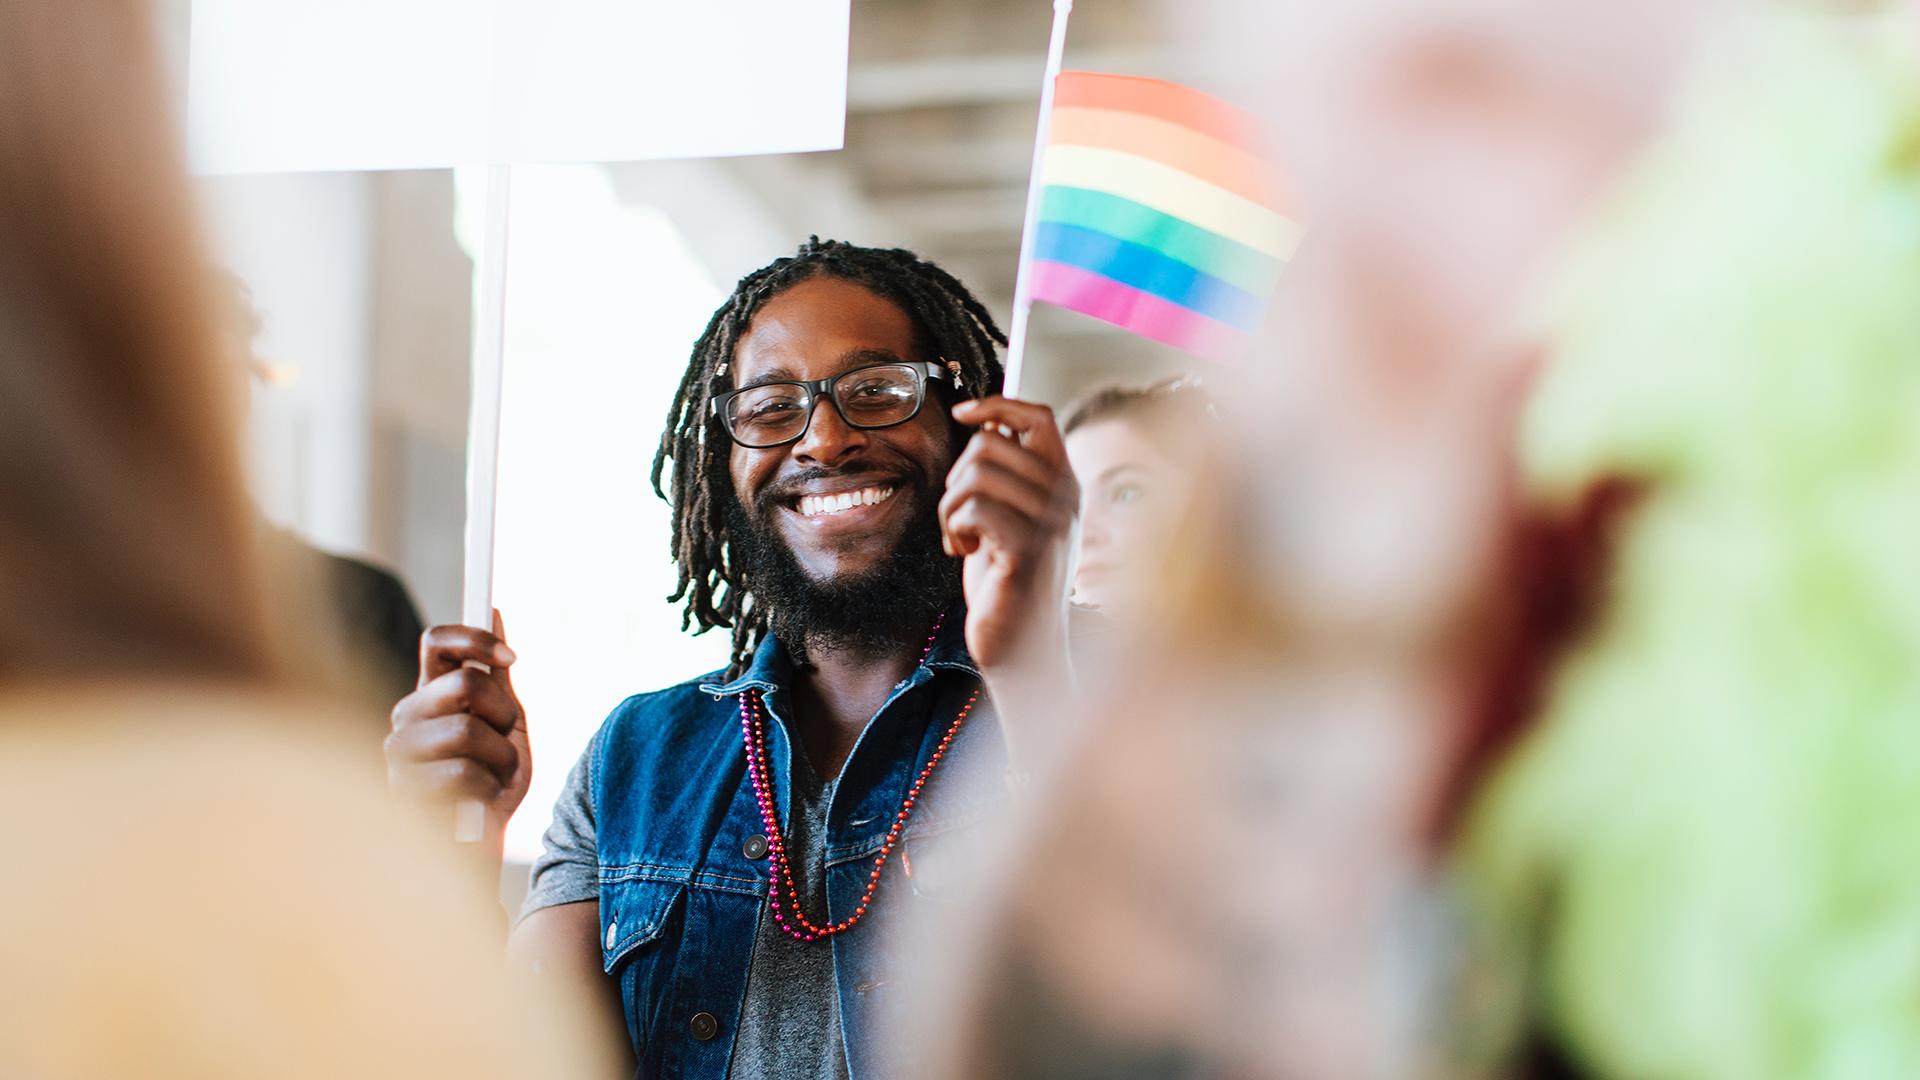 A person holding a rainbow flag